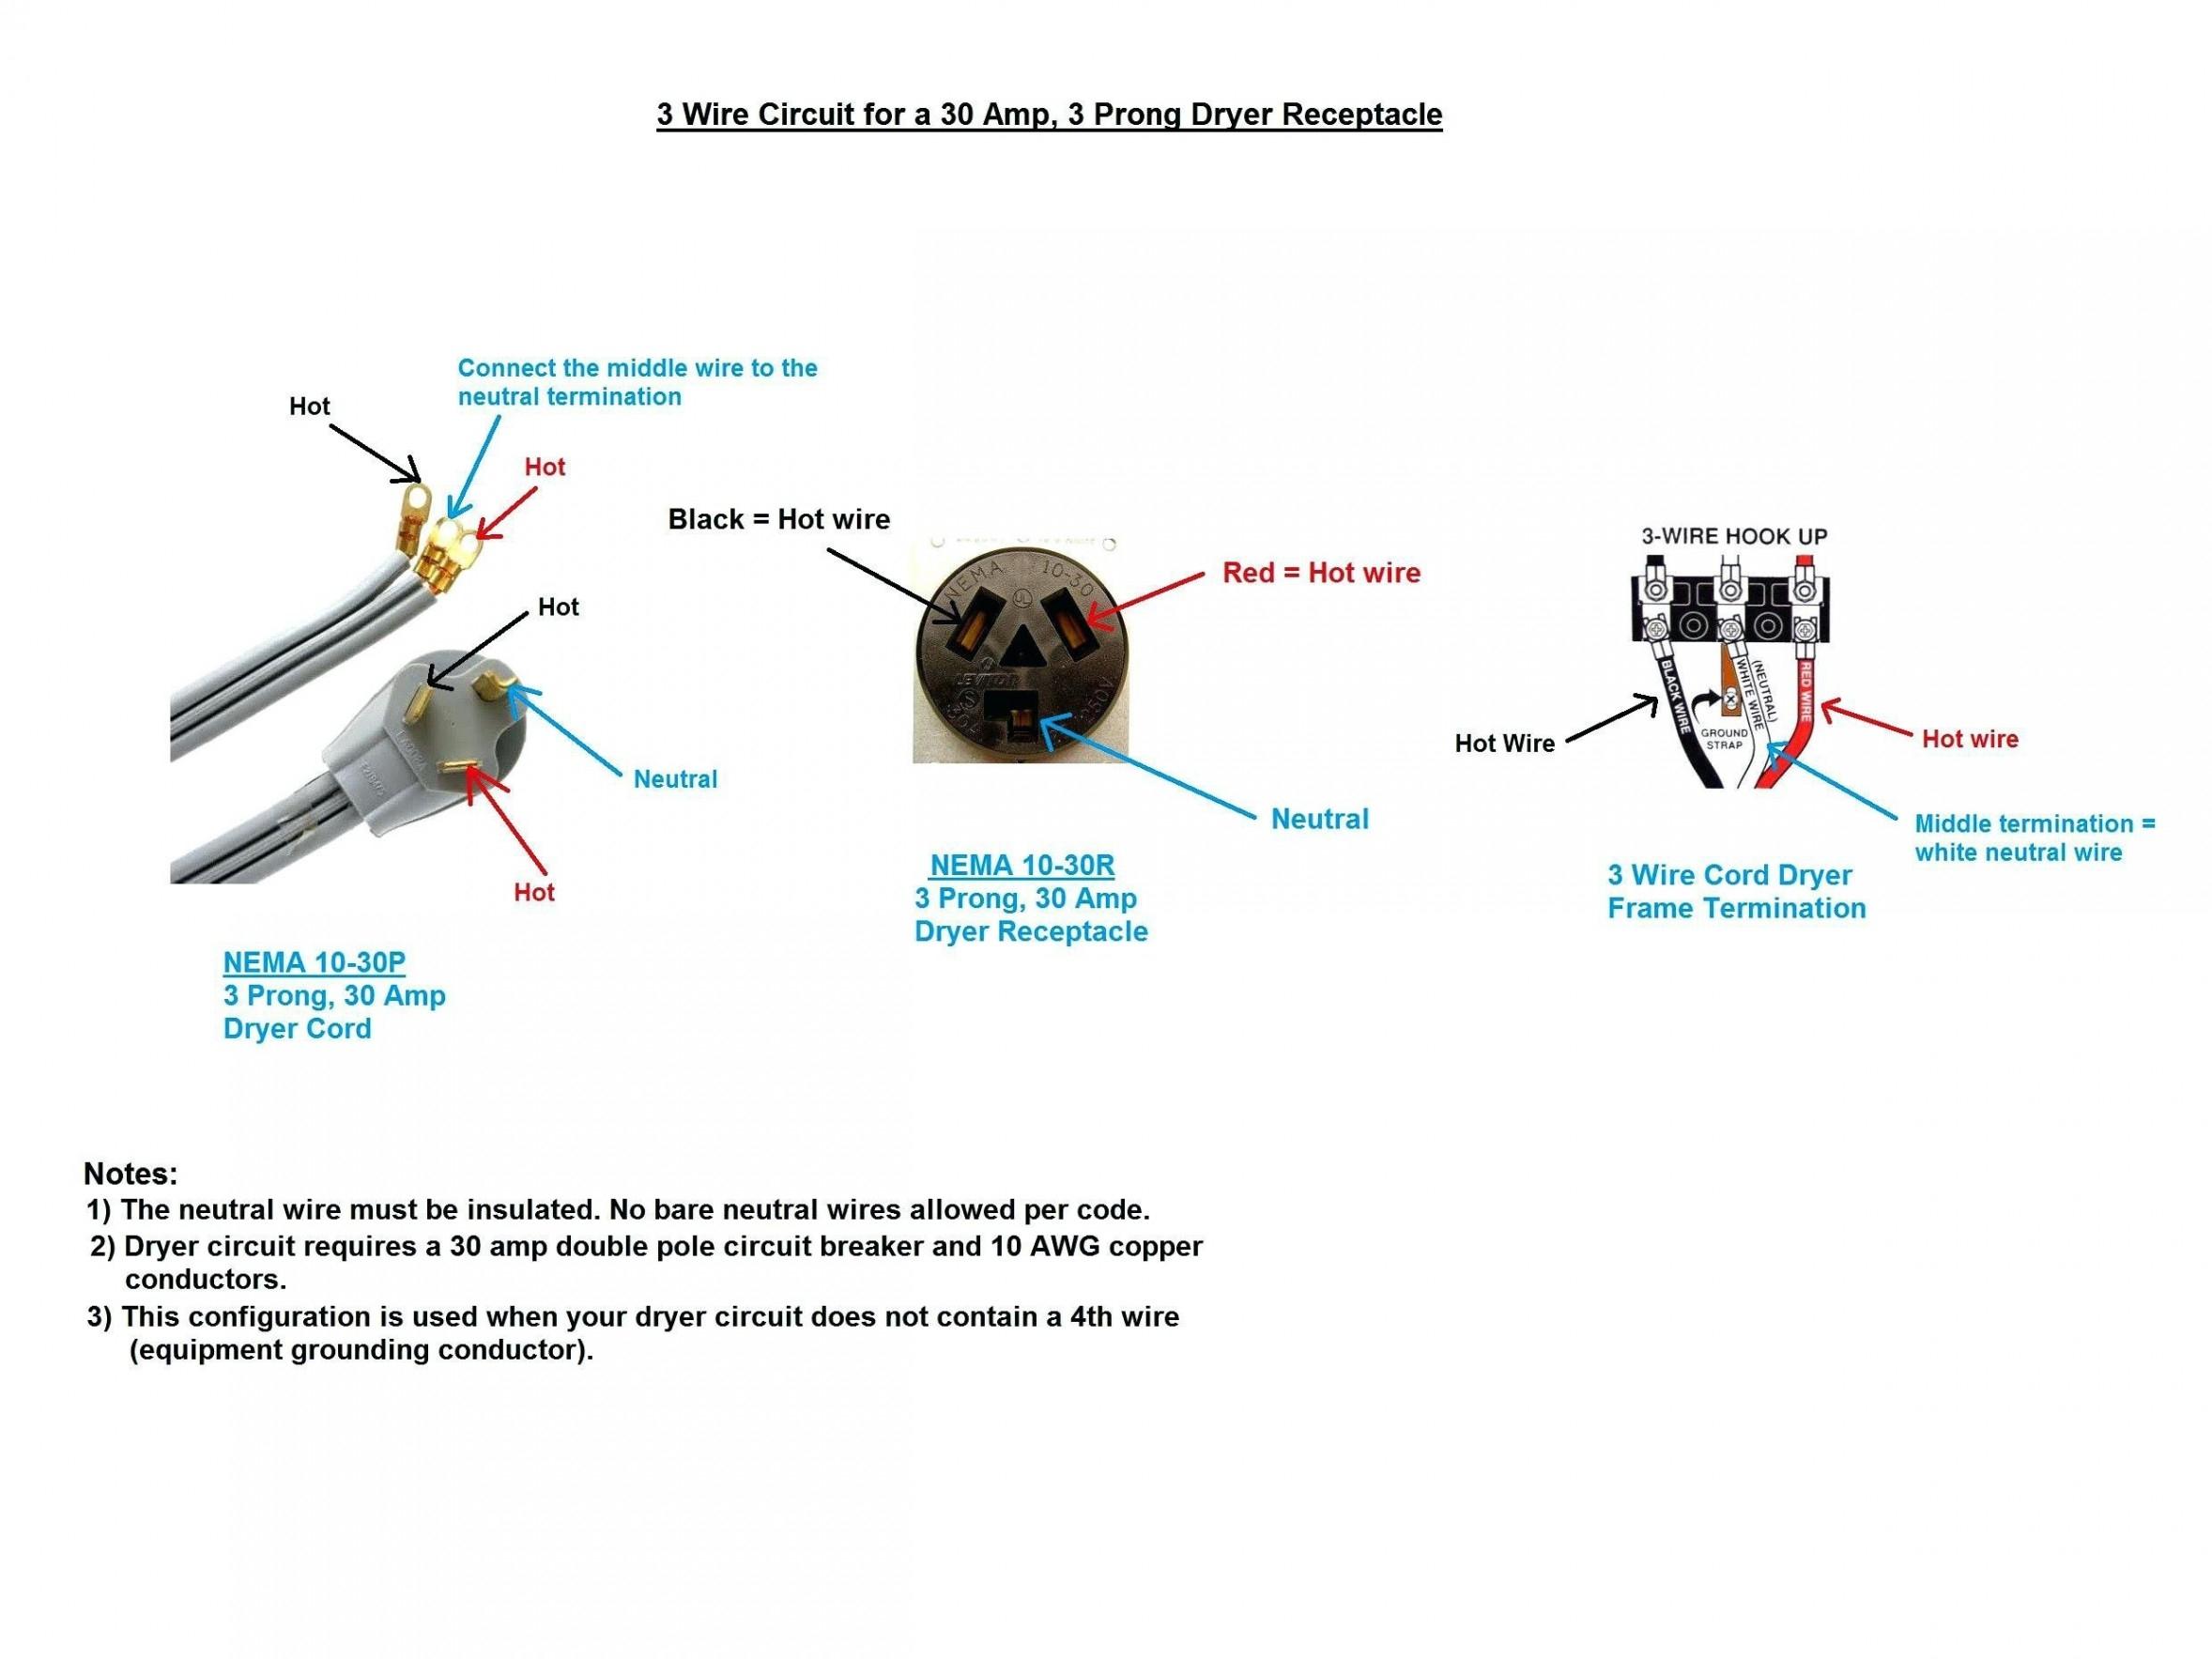 Pleasing Extension Cord To Dryer Plug On 50 Amp Welder Plug Wiring Diagram Wiring Cloud Licukaidewilluminateatxorg